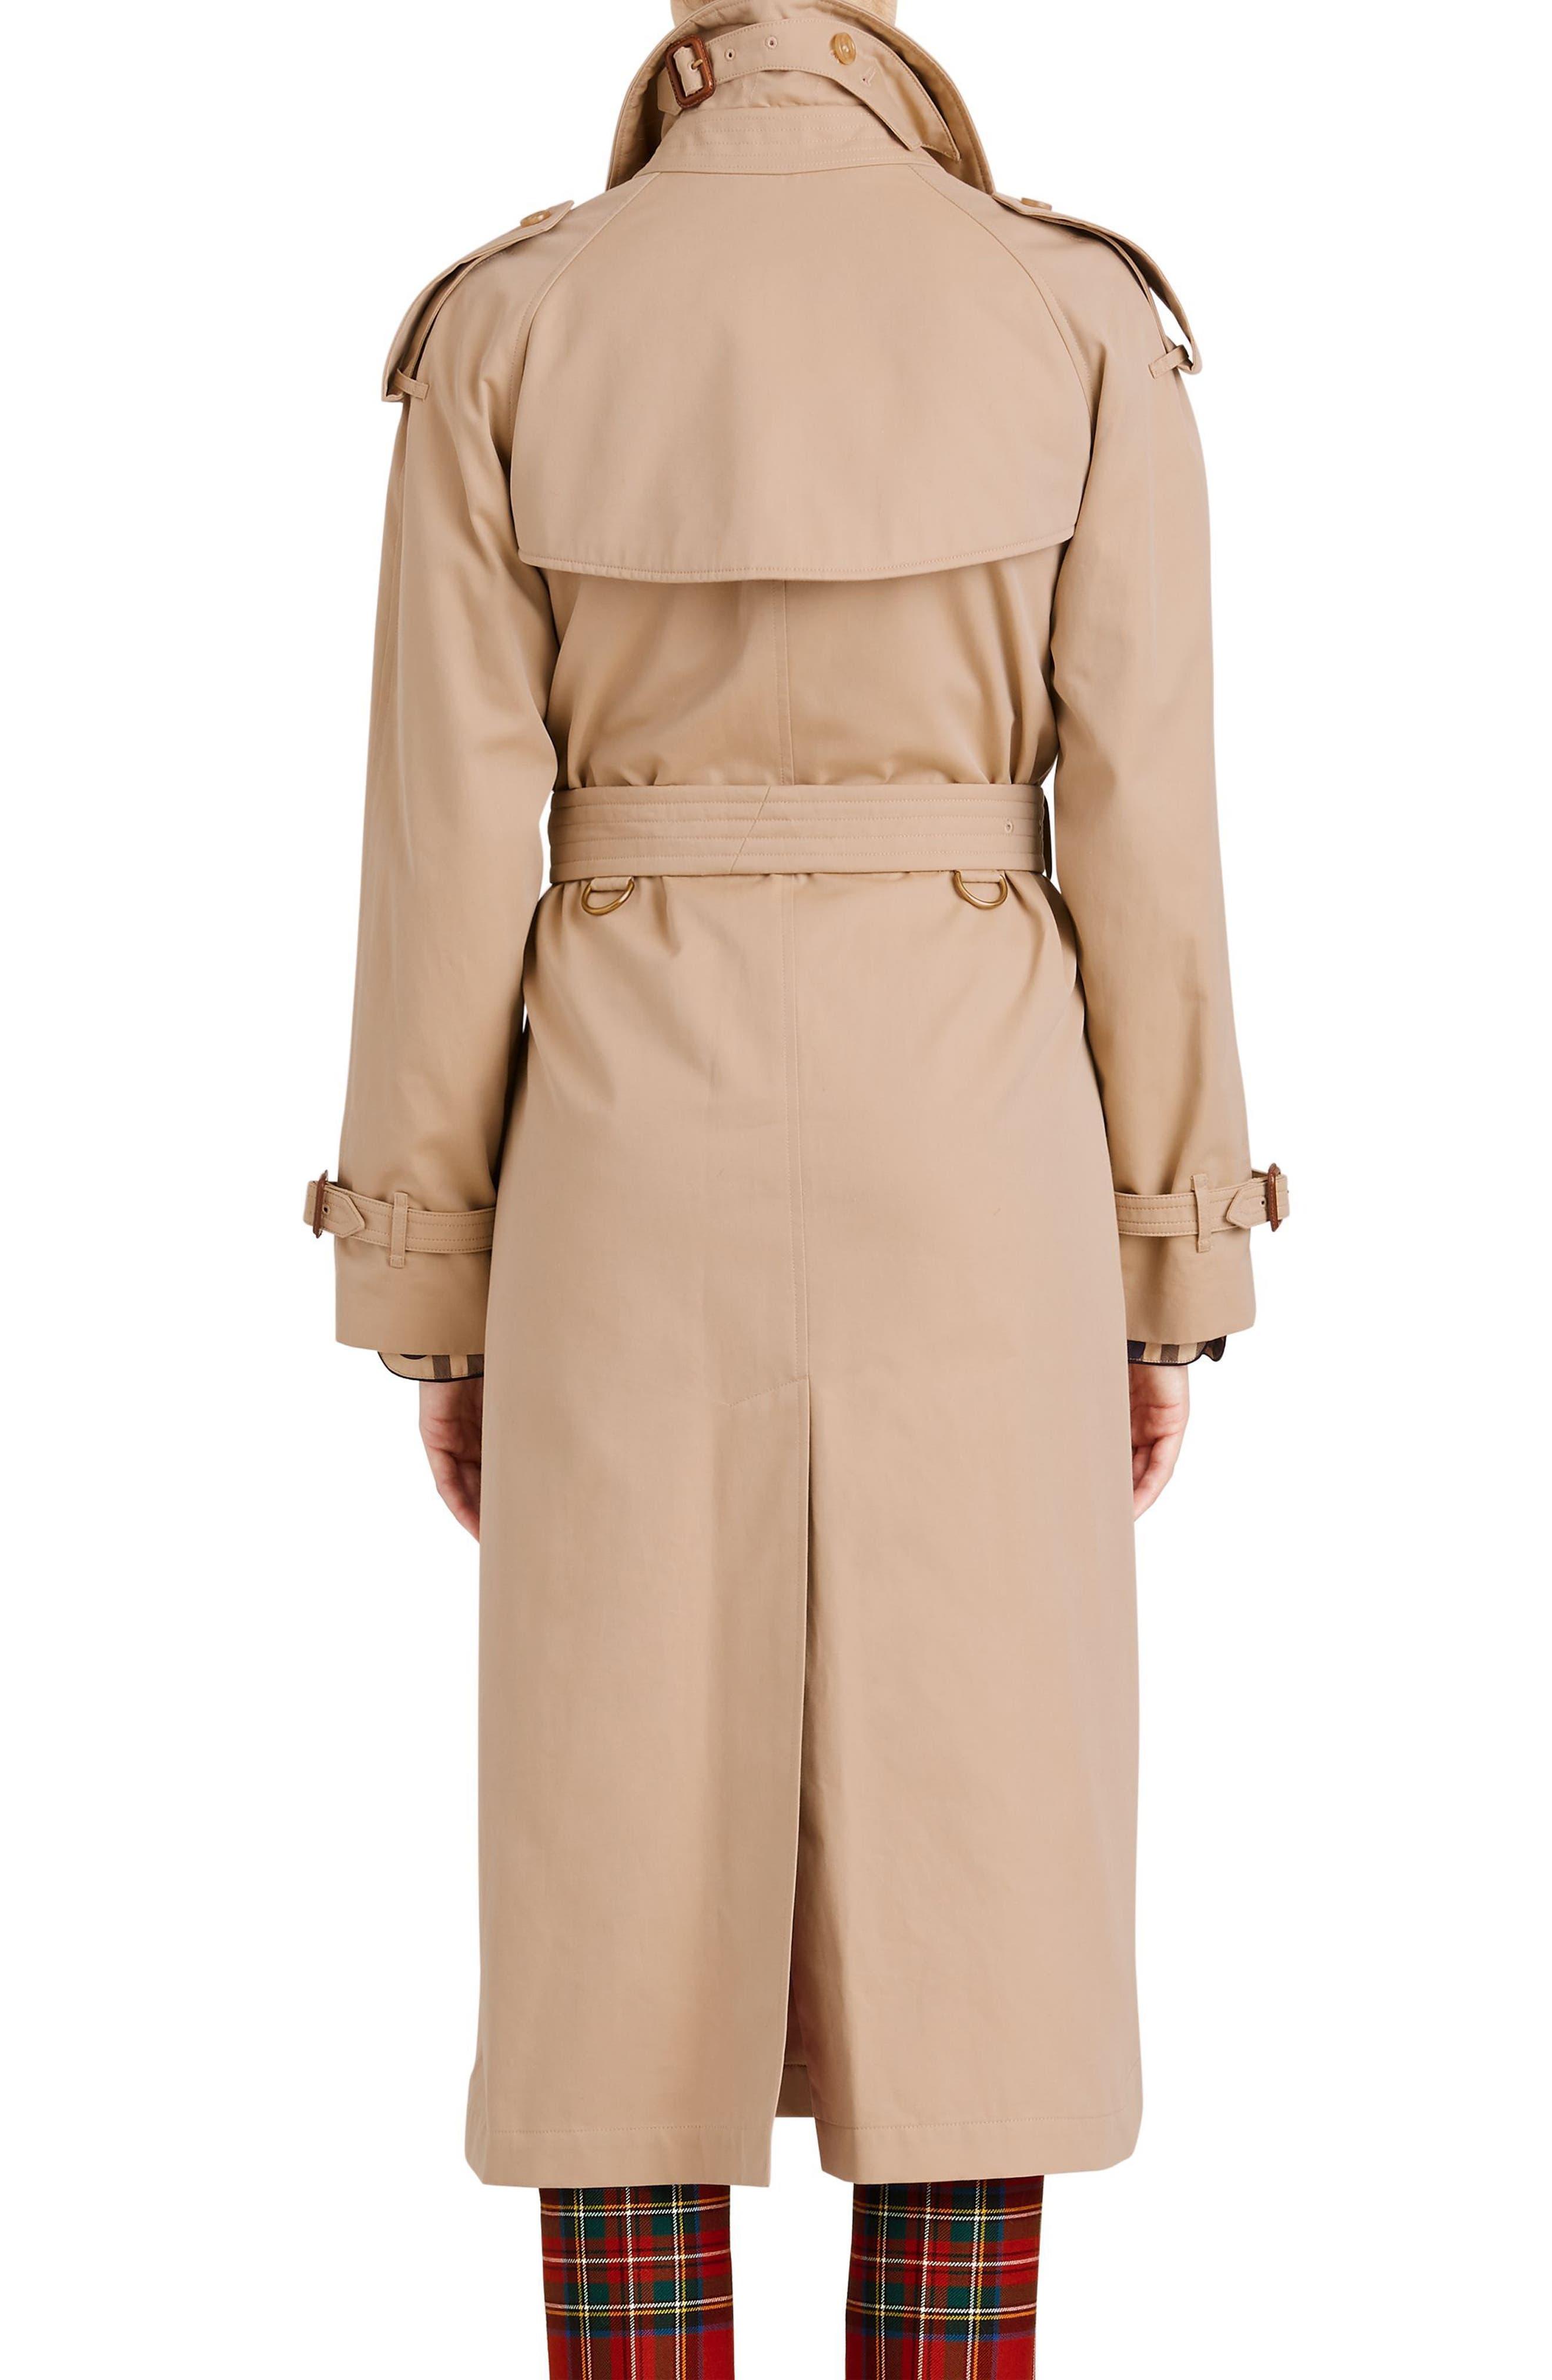 Eastheath Bird Button Cotton Trench Coat,                             Alternate thumbnail 2, color,                             Honey